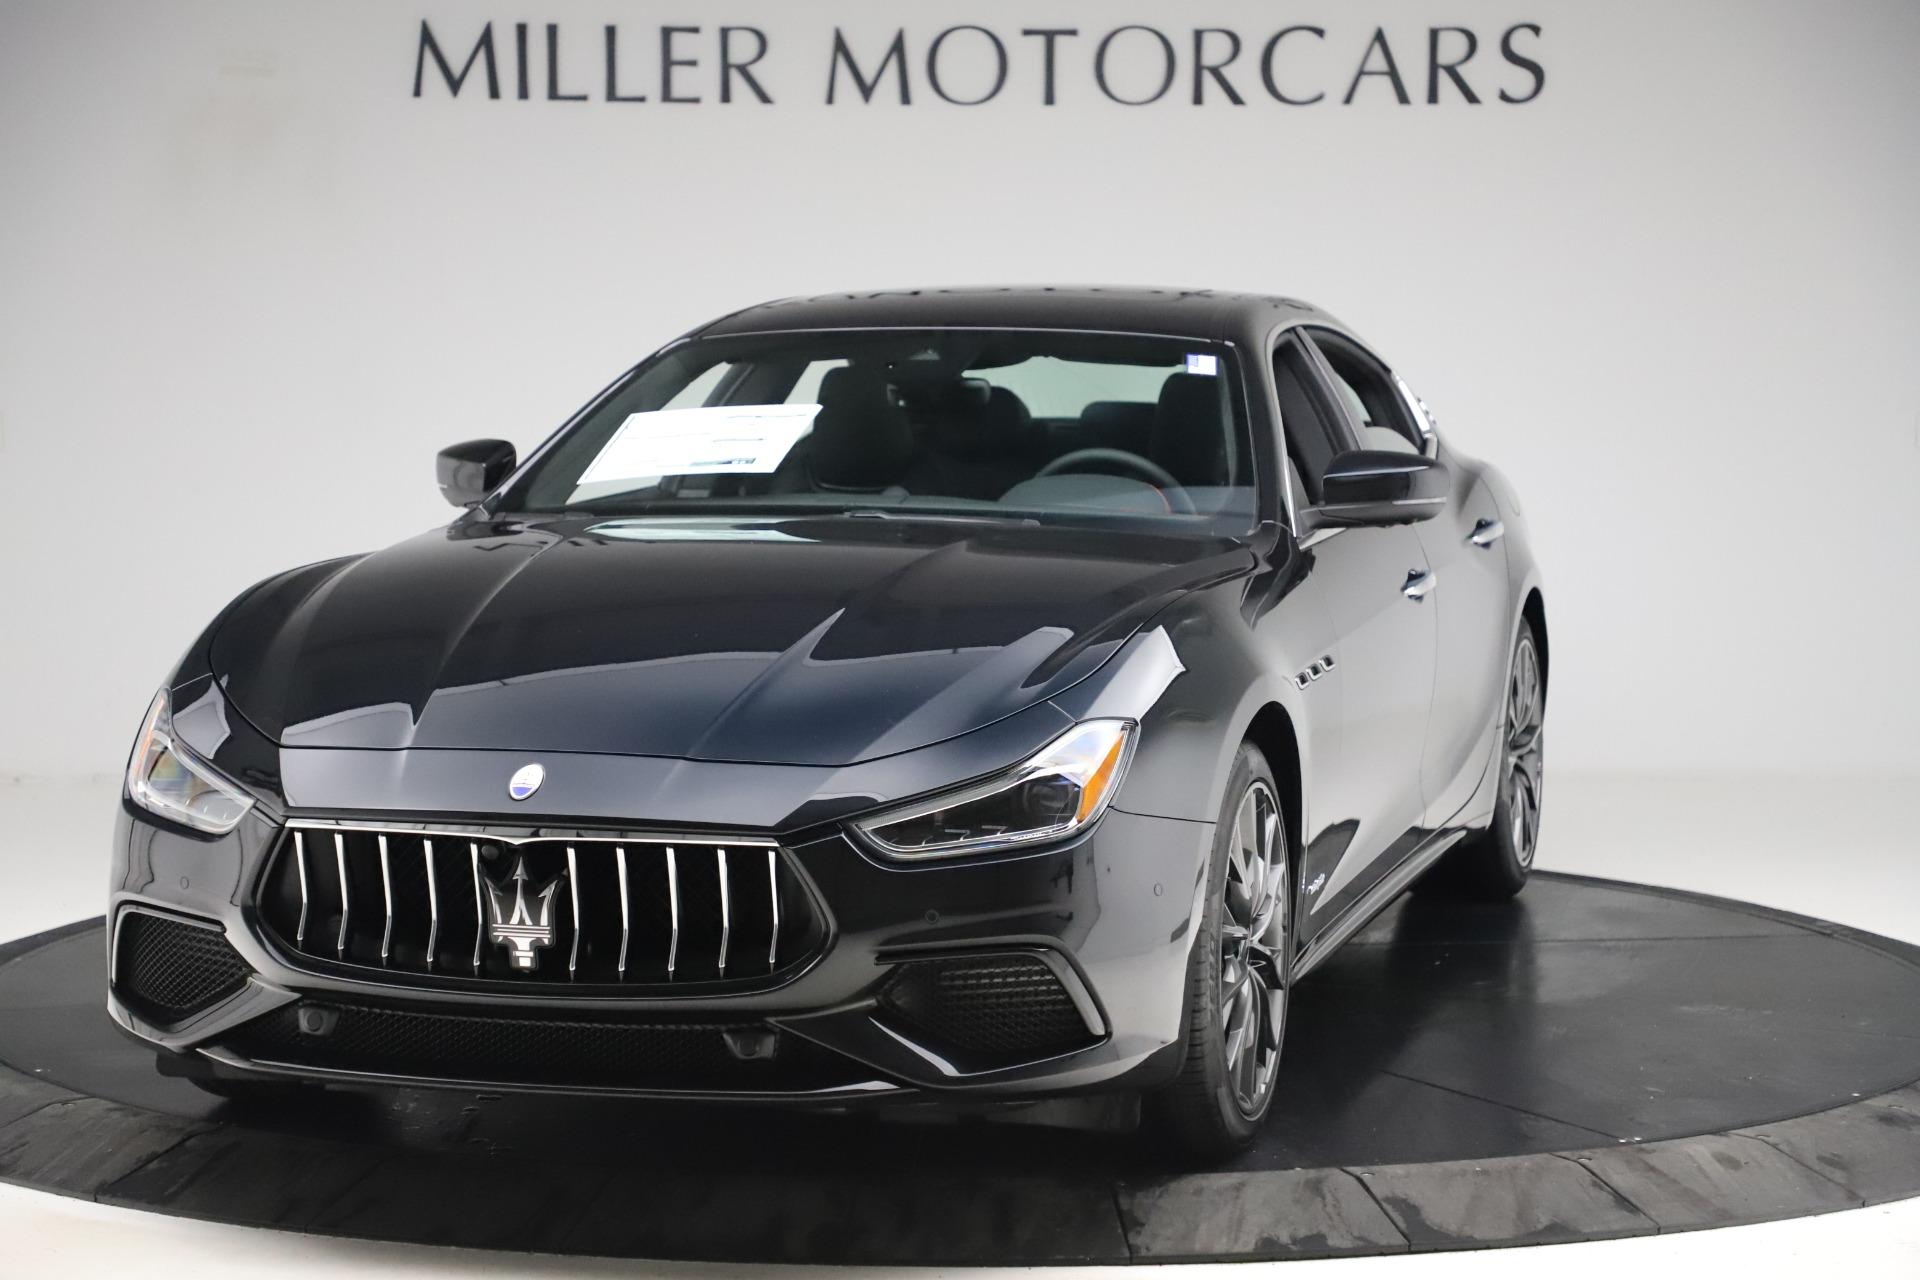 New 2019 Maserati Ghibli S Q4 GranSport for sale $99,905 at McLaren Greenwich in Greenwich CT 06830 1